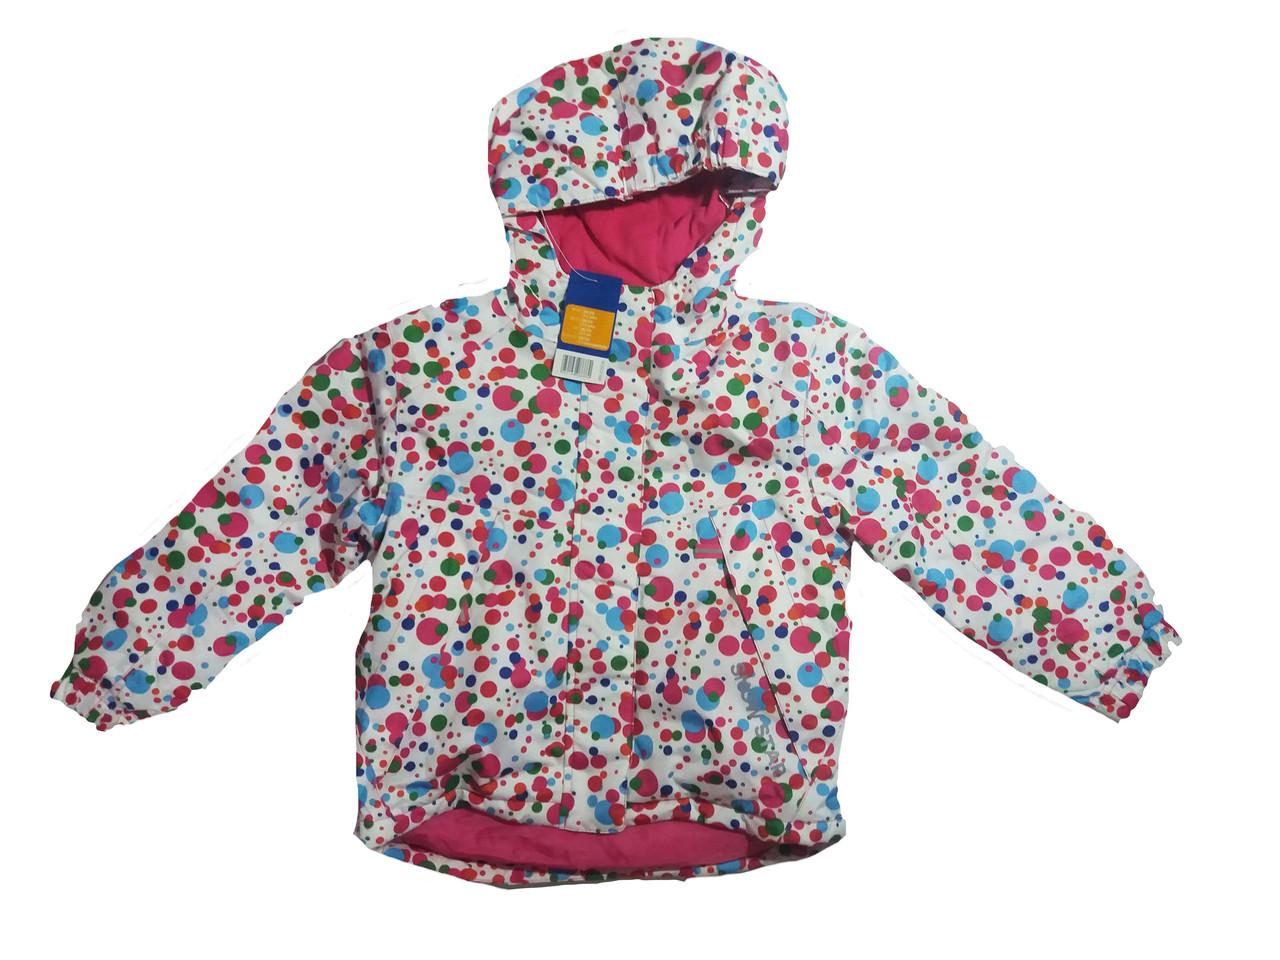 Куртка  для девочки, Lupilu, размер 98/104, арт. Л-409